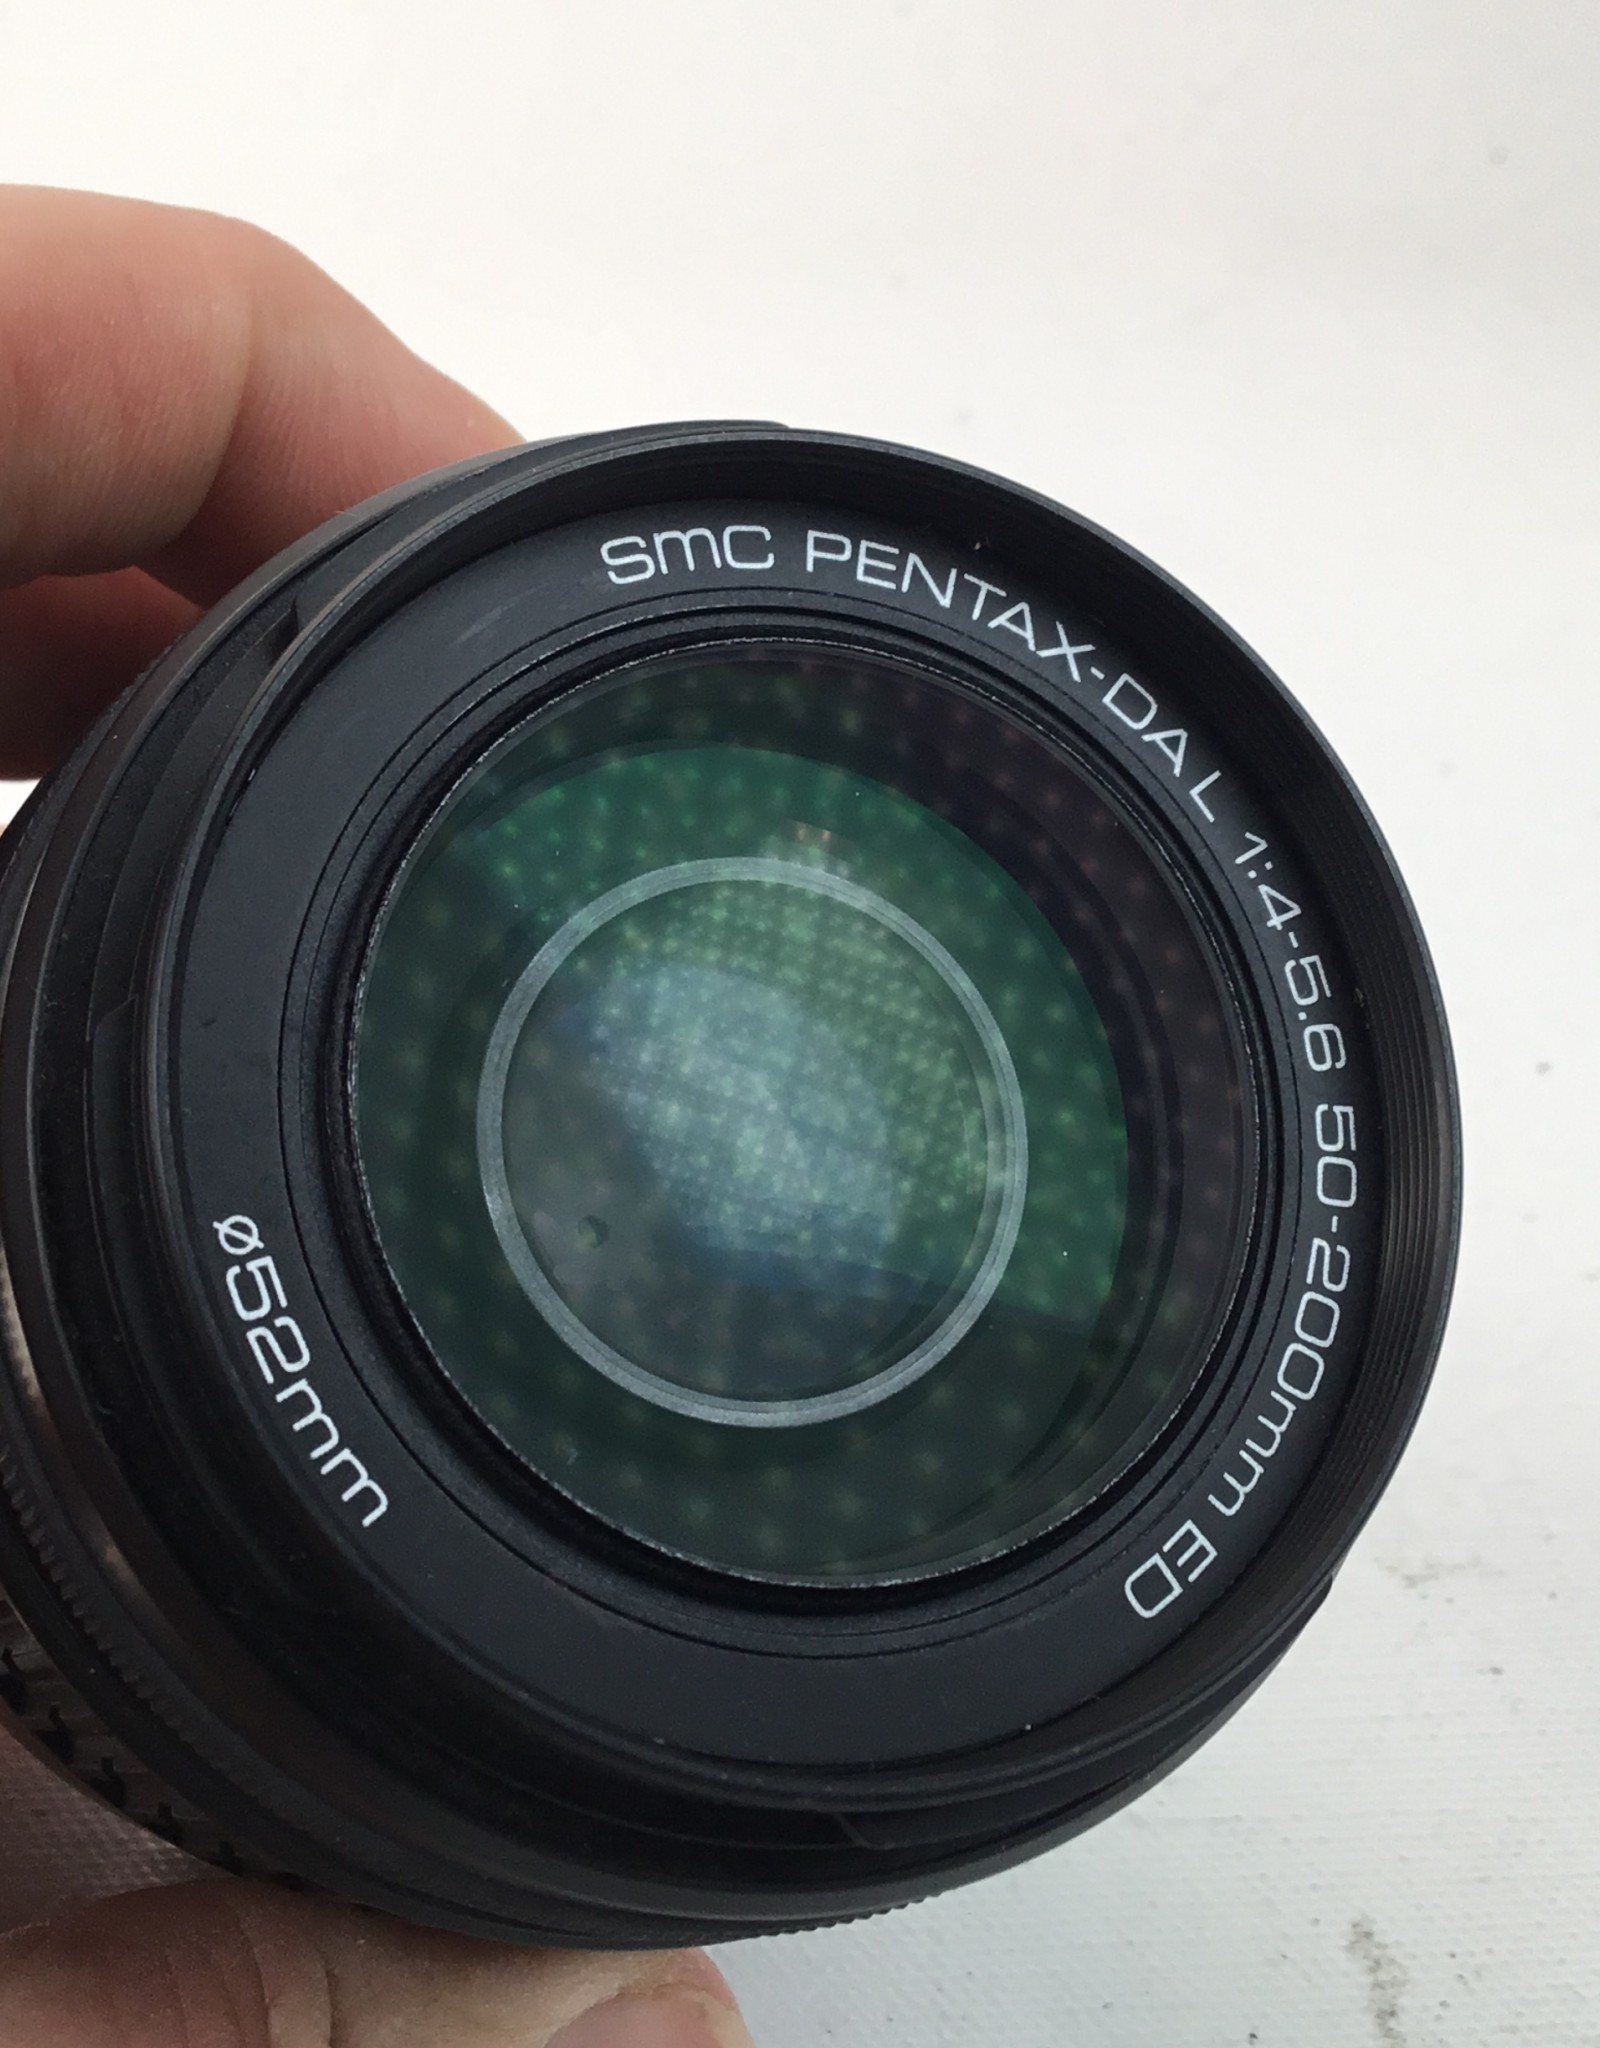 Pentax Pentax DAL SMC 50-200mm f4-5.6 ED Lens Used EX